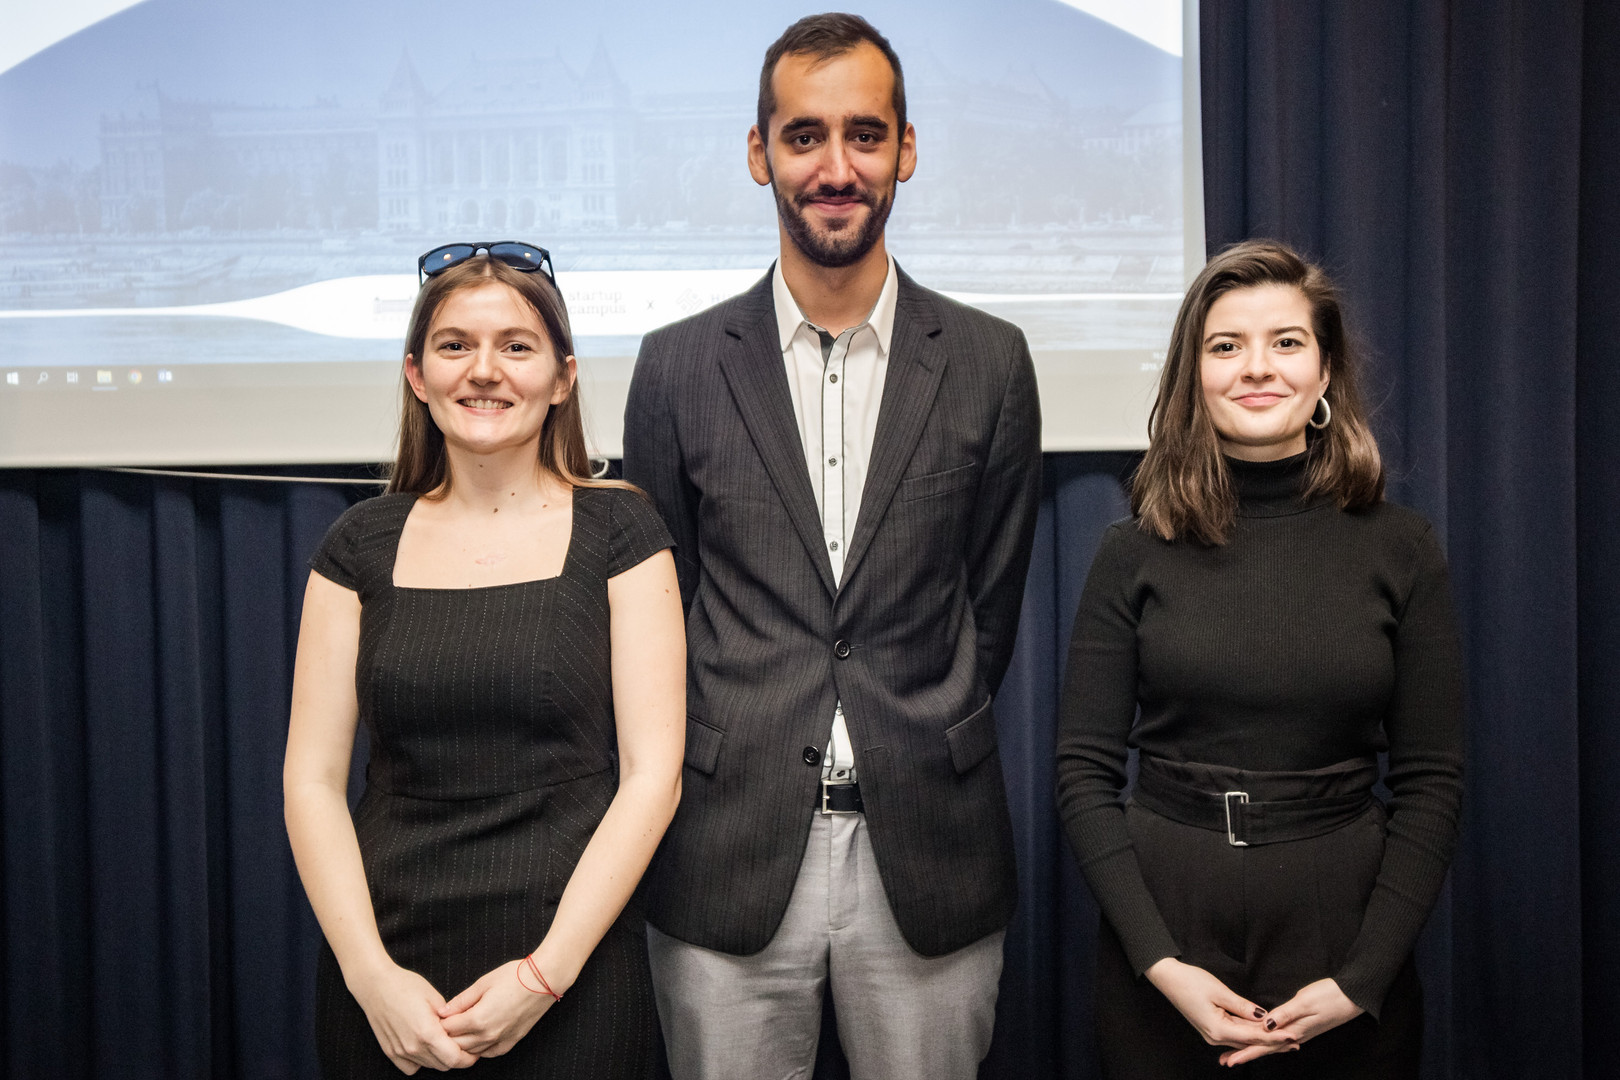 Plantoon - Winners of the 2018 program